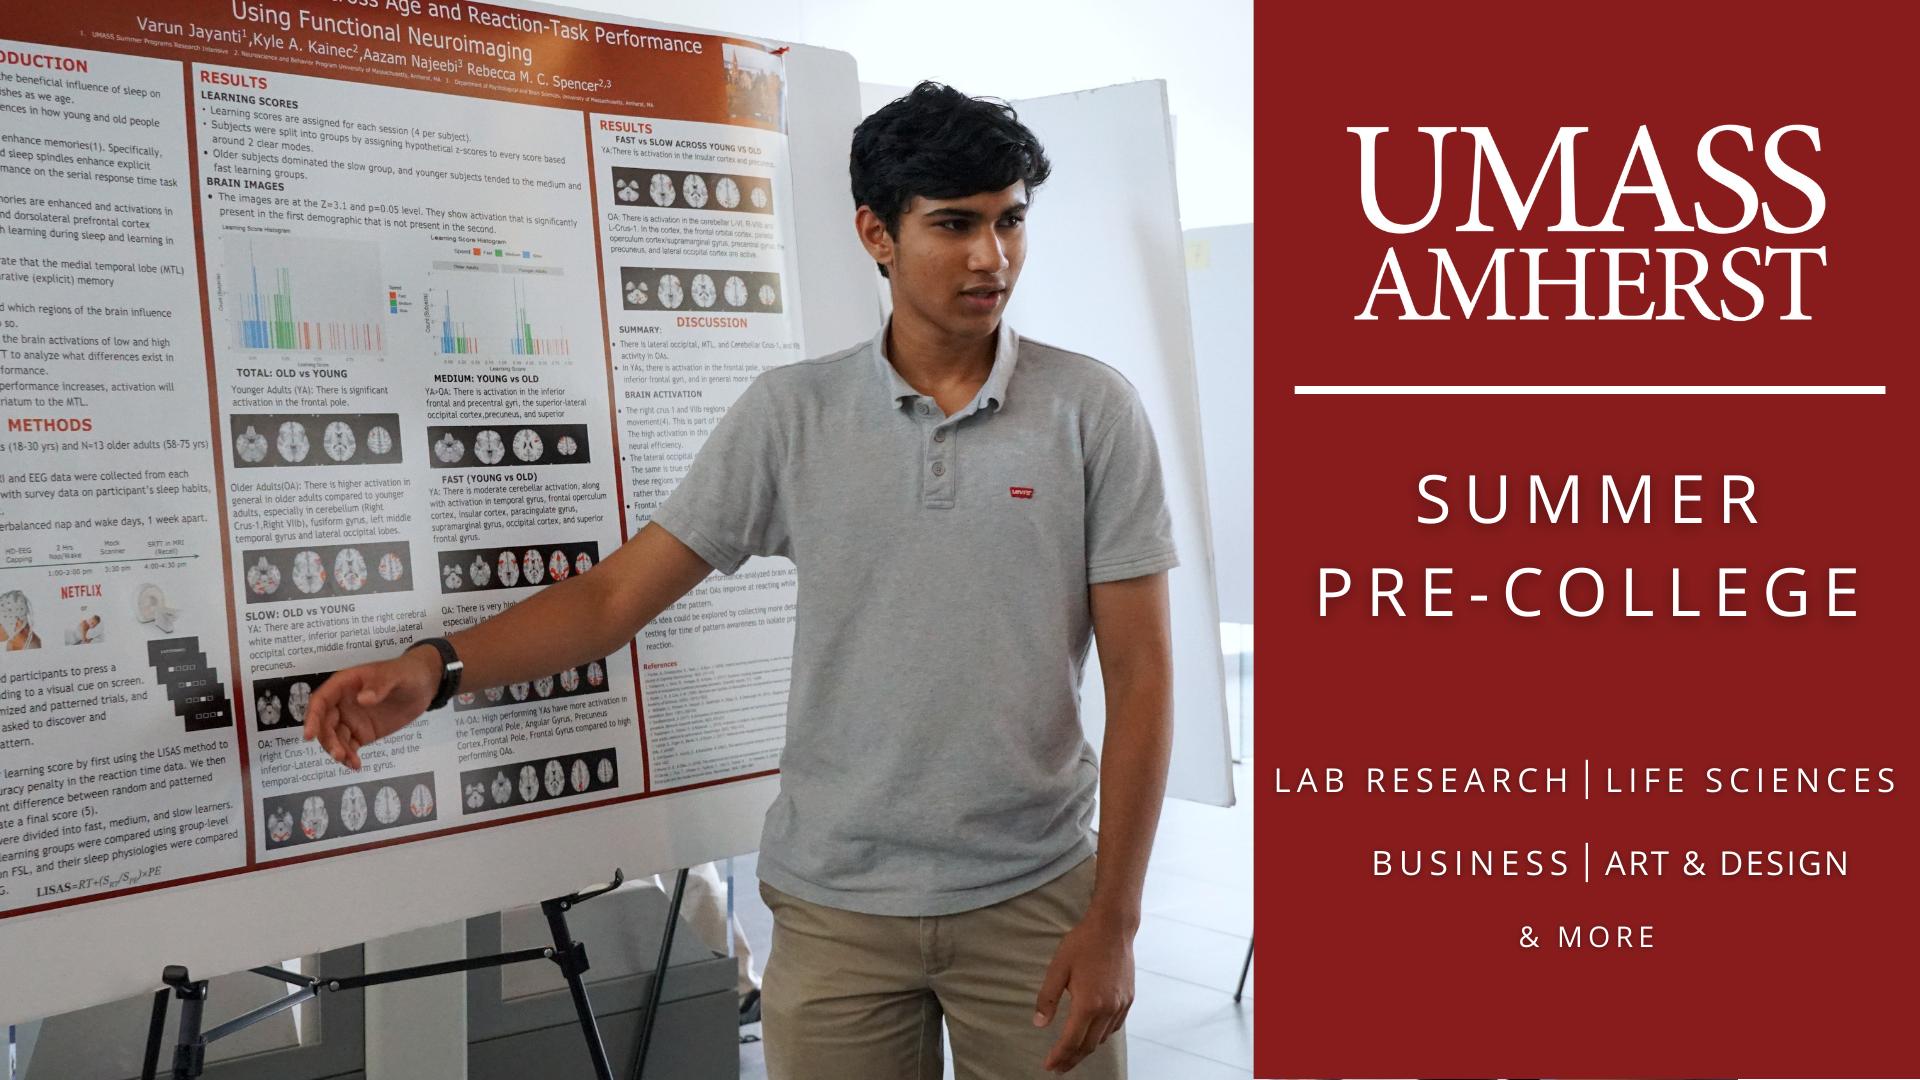 UMass Amherst Summer Pre-College: Isenberg Business Ethics Academy